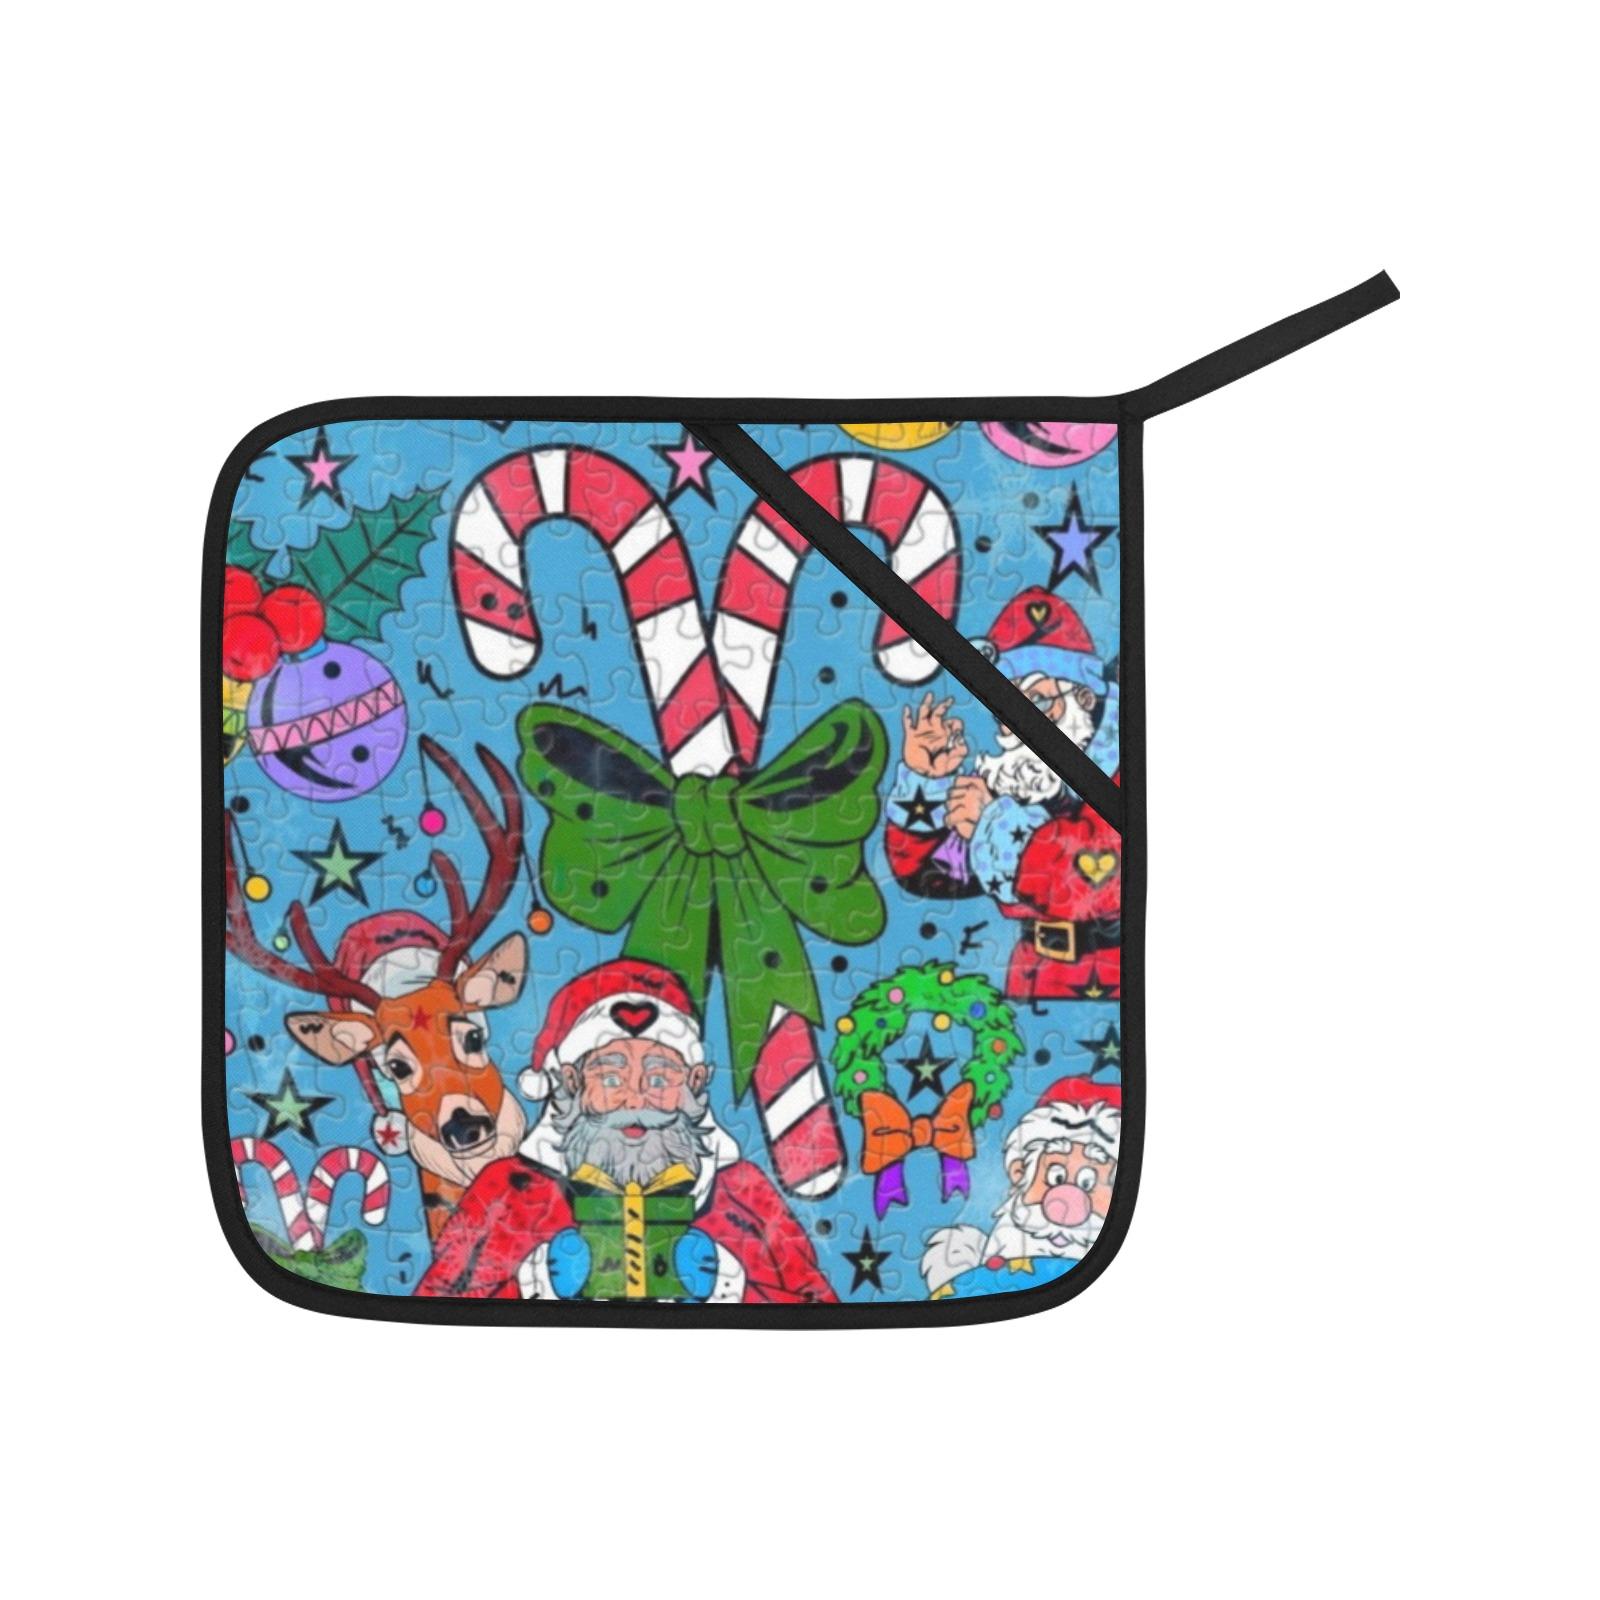 Hohoho Christmas by Nico Bielow Oven Mitt & Pot Holder